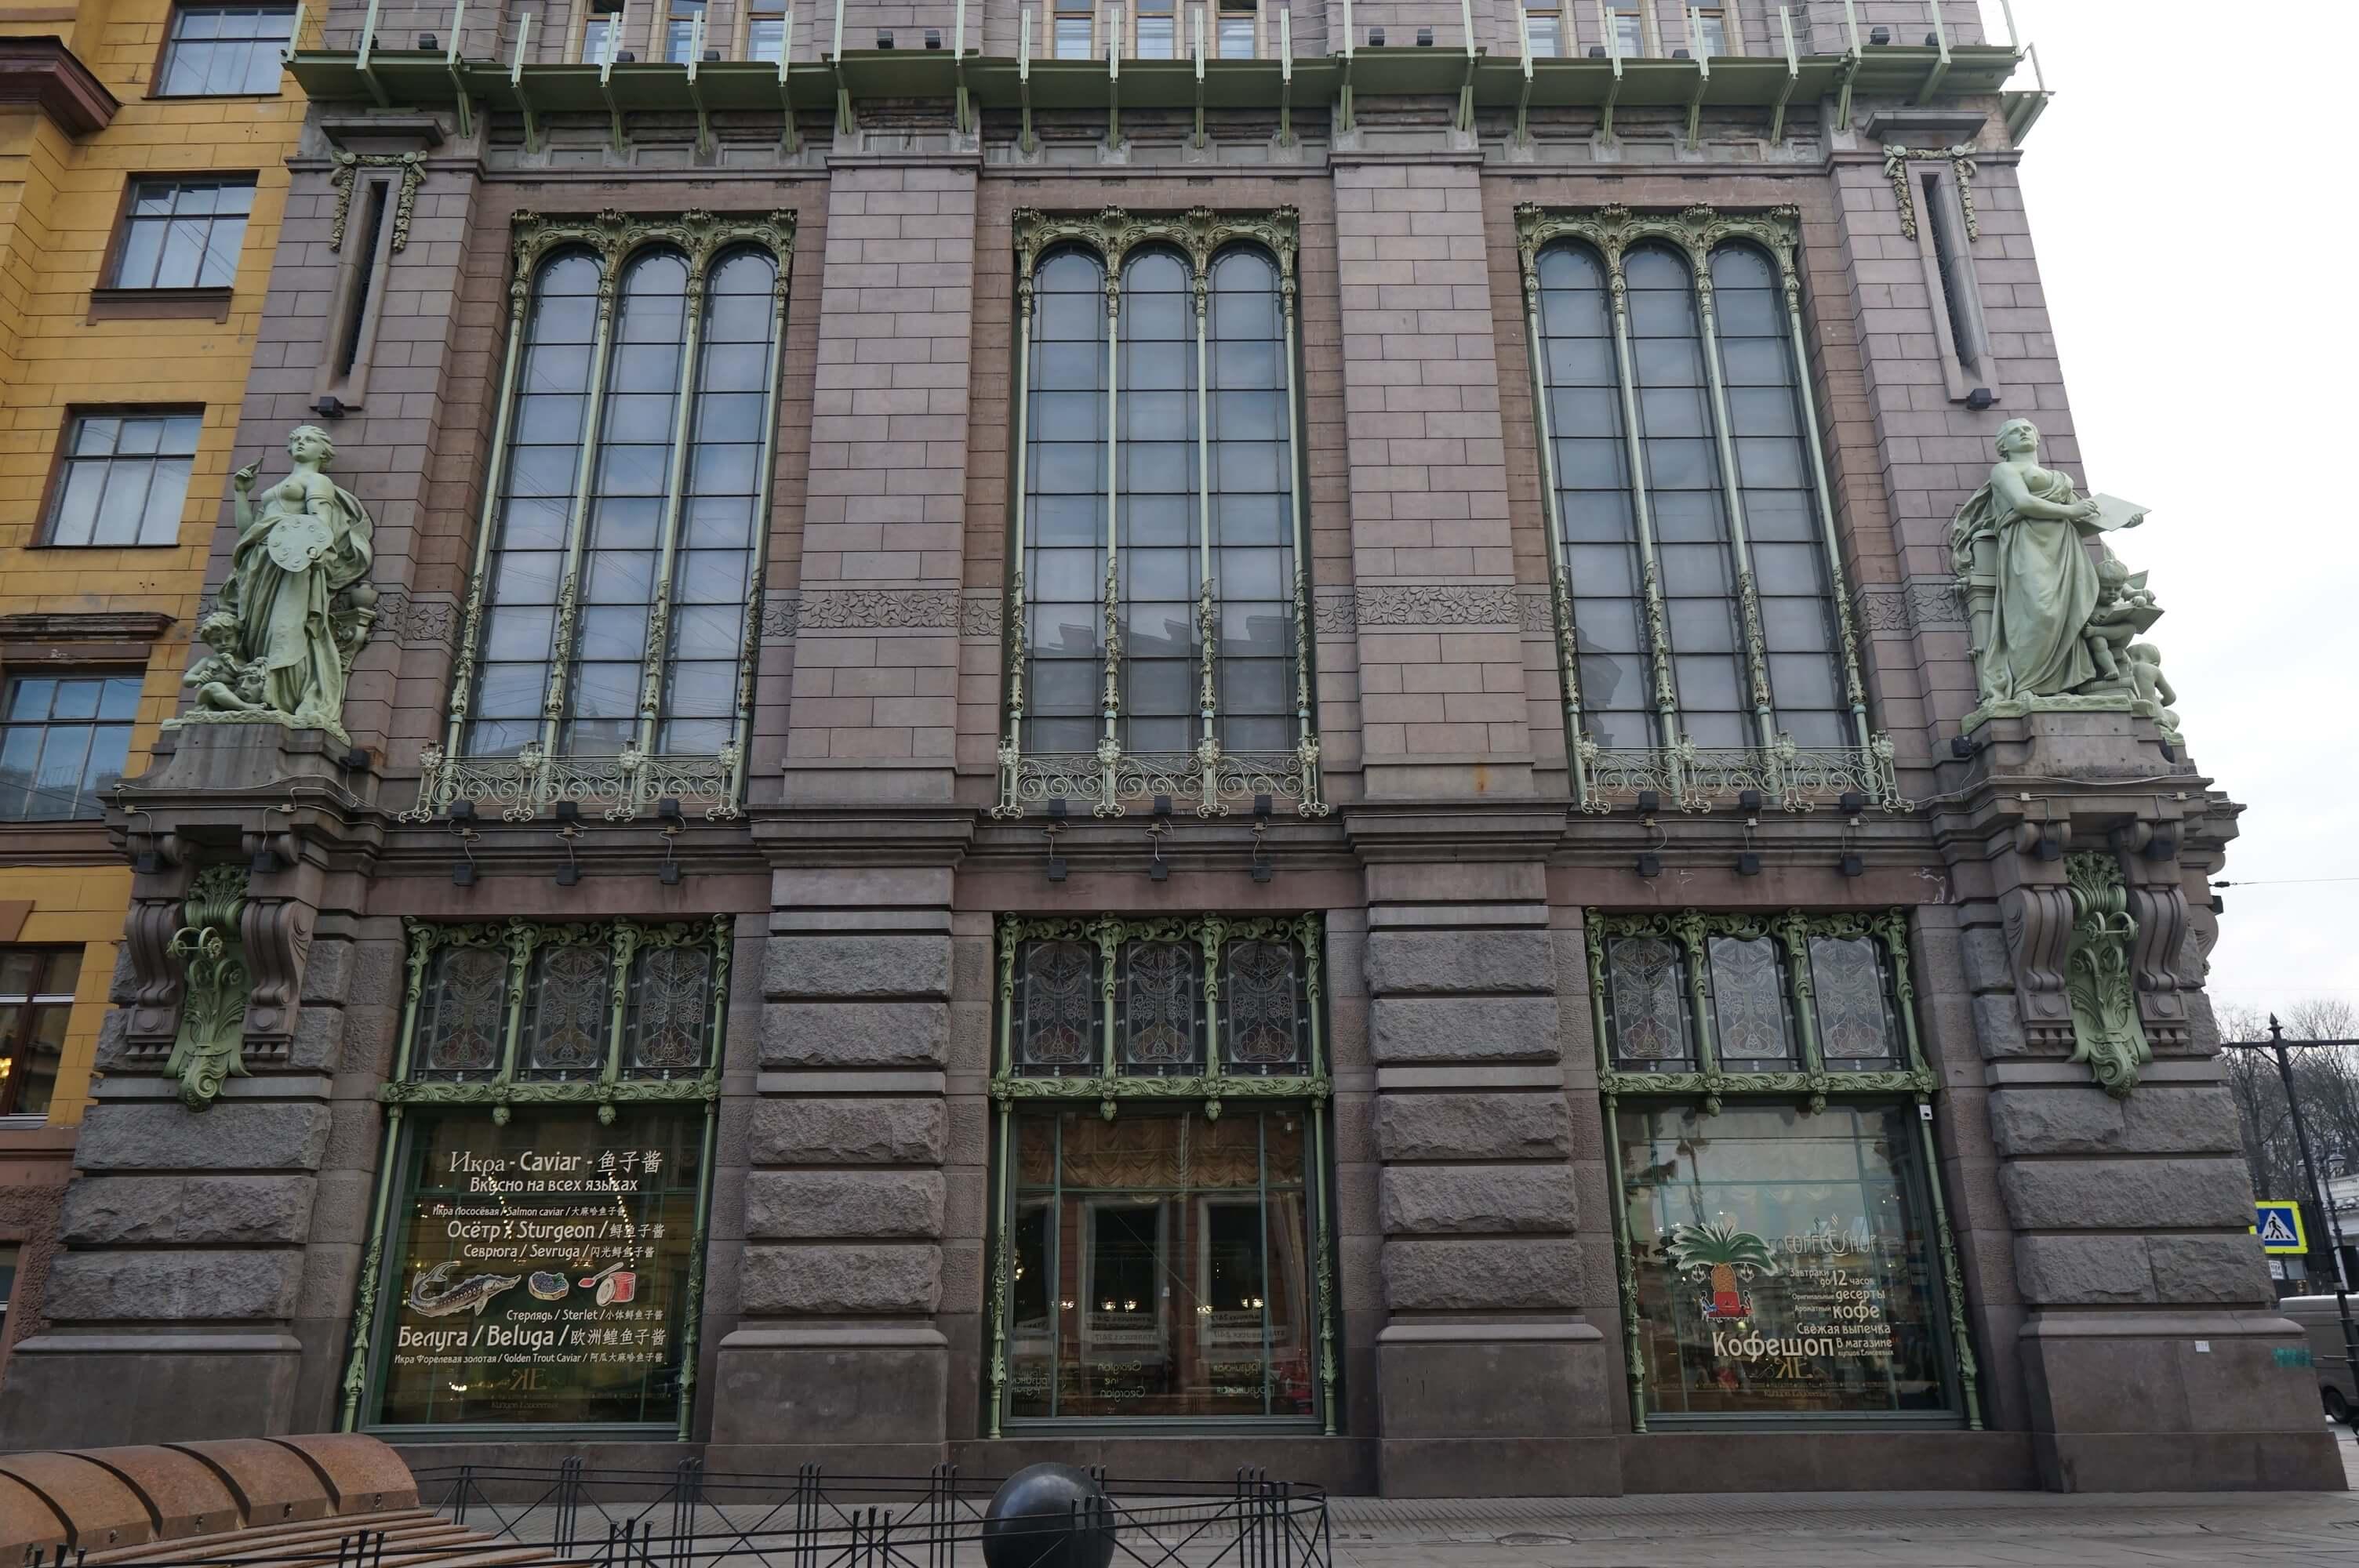 Фасад магазина купцов Елисеевых